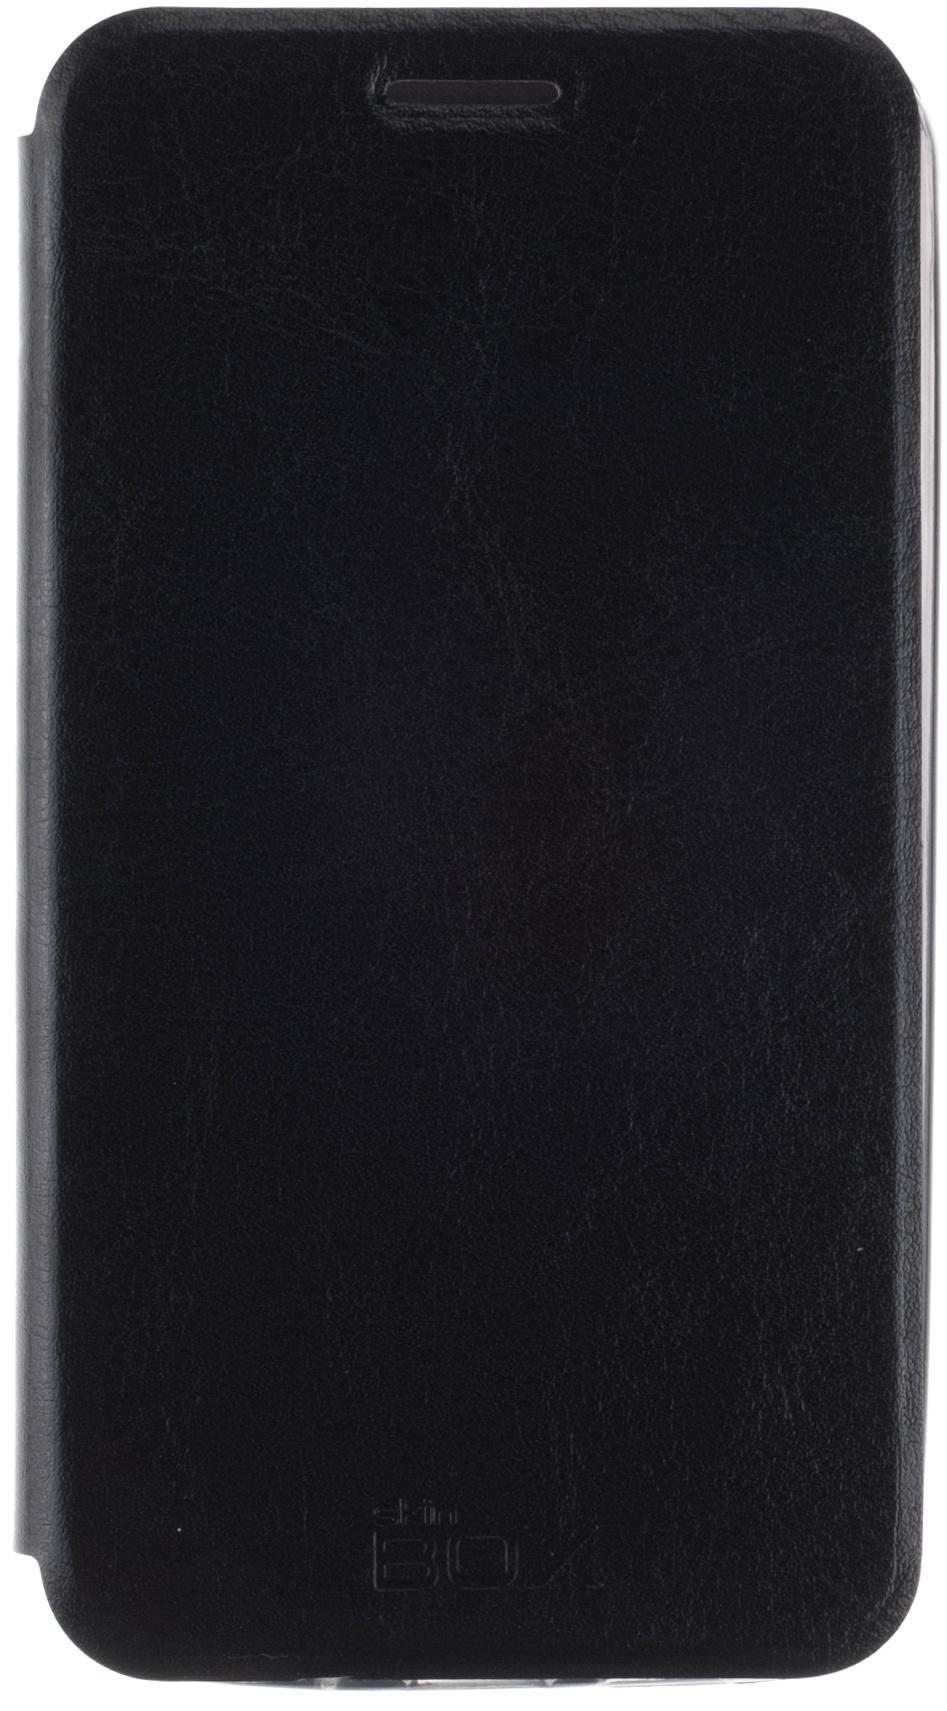 Чехол SkinBox Lux для Meizu MX4, 2000000076089, черный